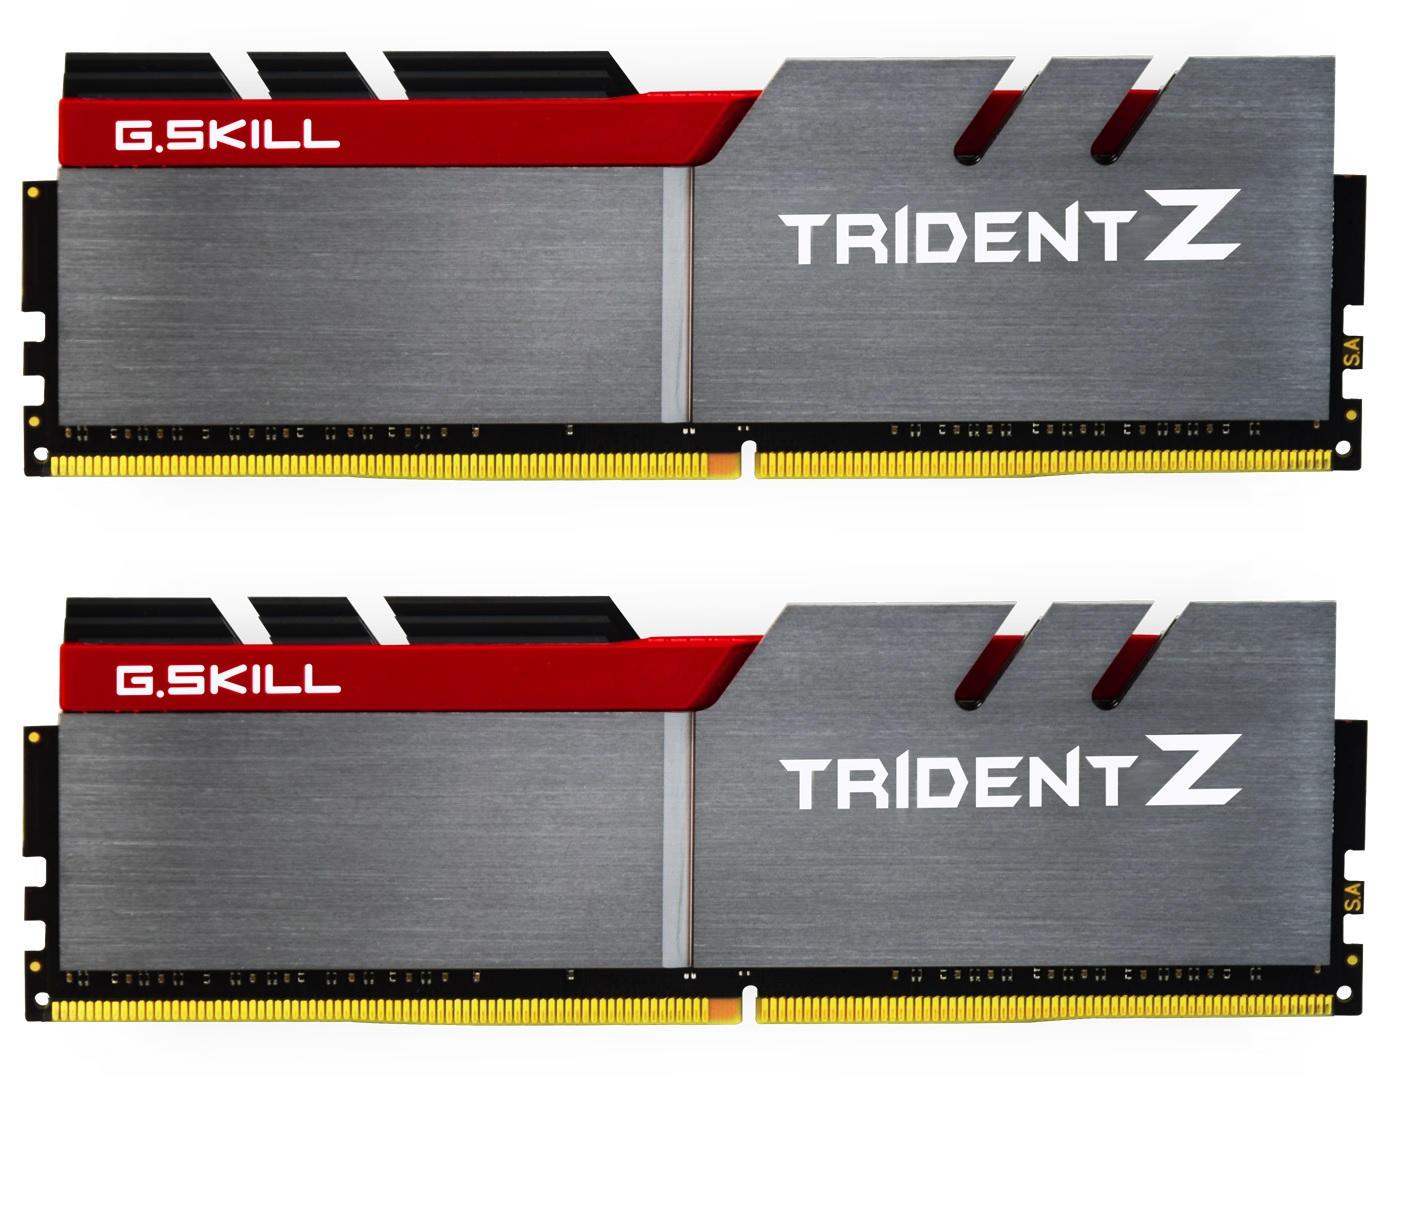 G.Skill Trident Z 16GB DDR4-3200 kit